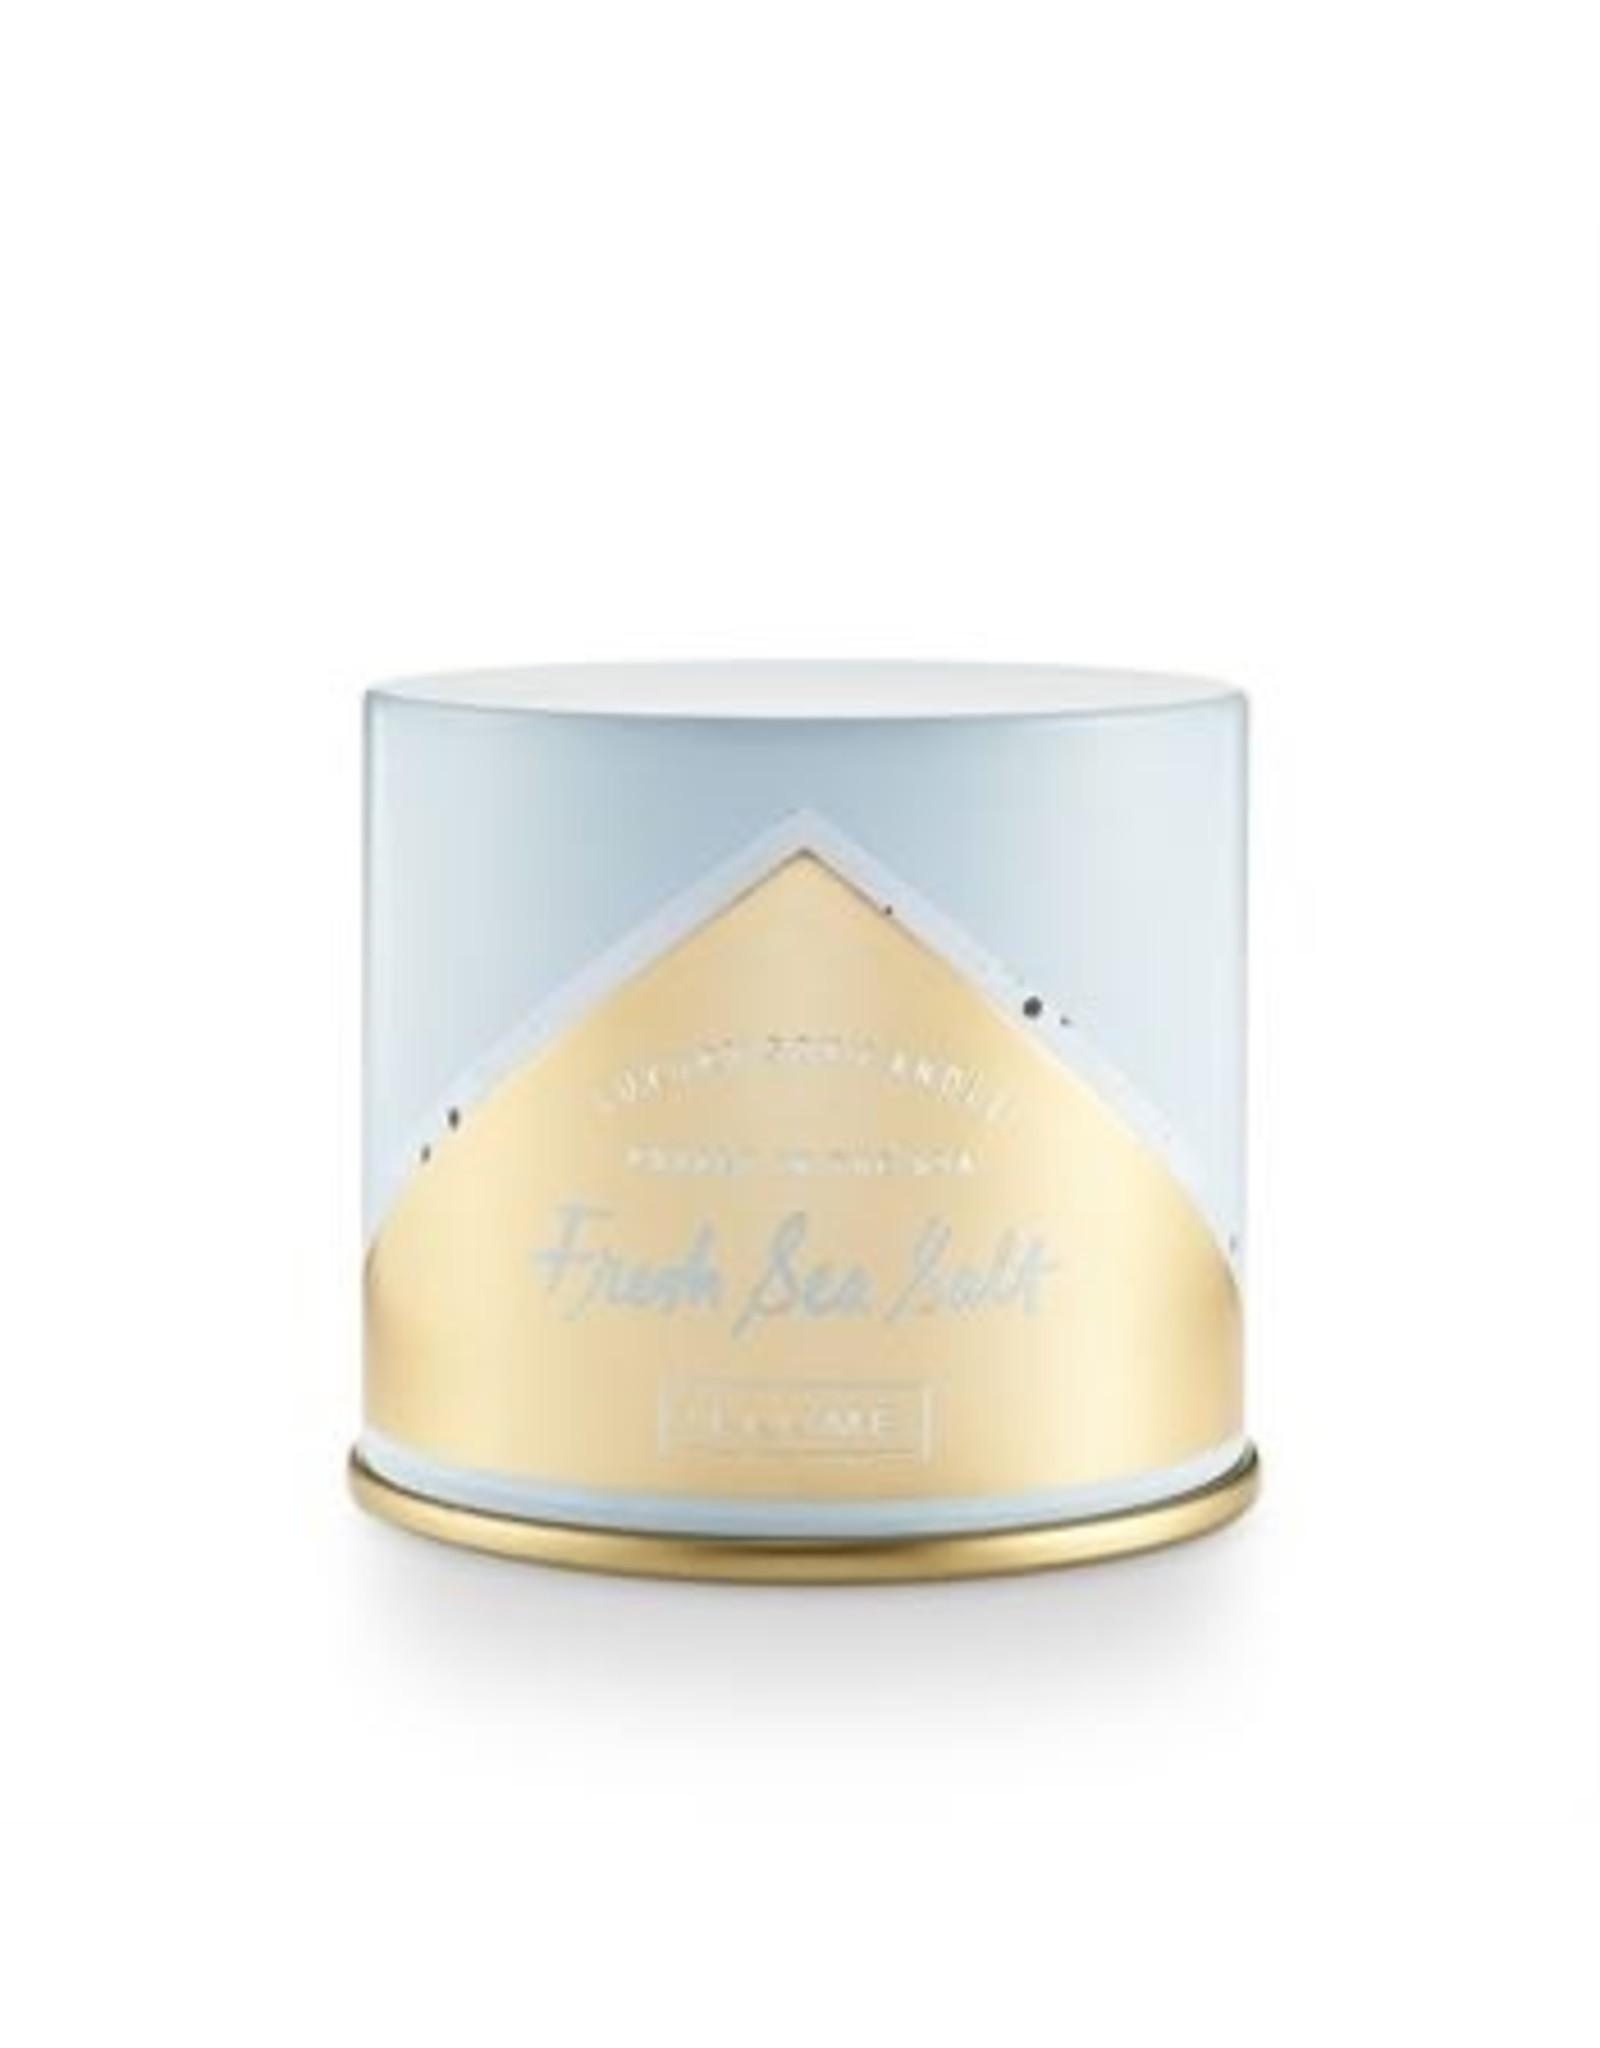 Illume Fresh Sea Salt Metal Candle - 11.8 oz